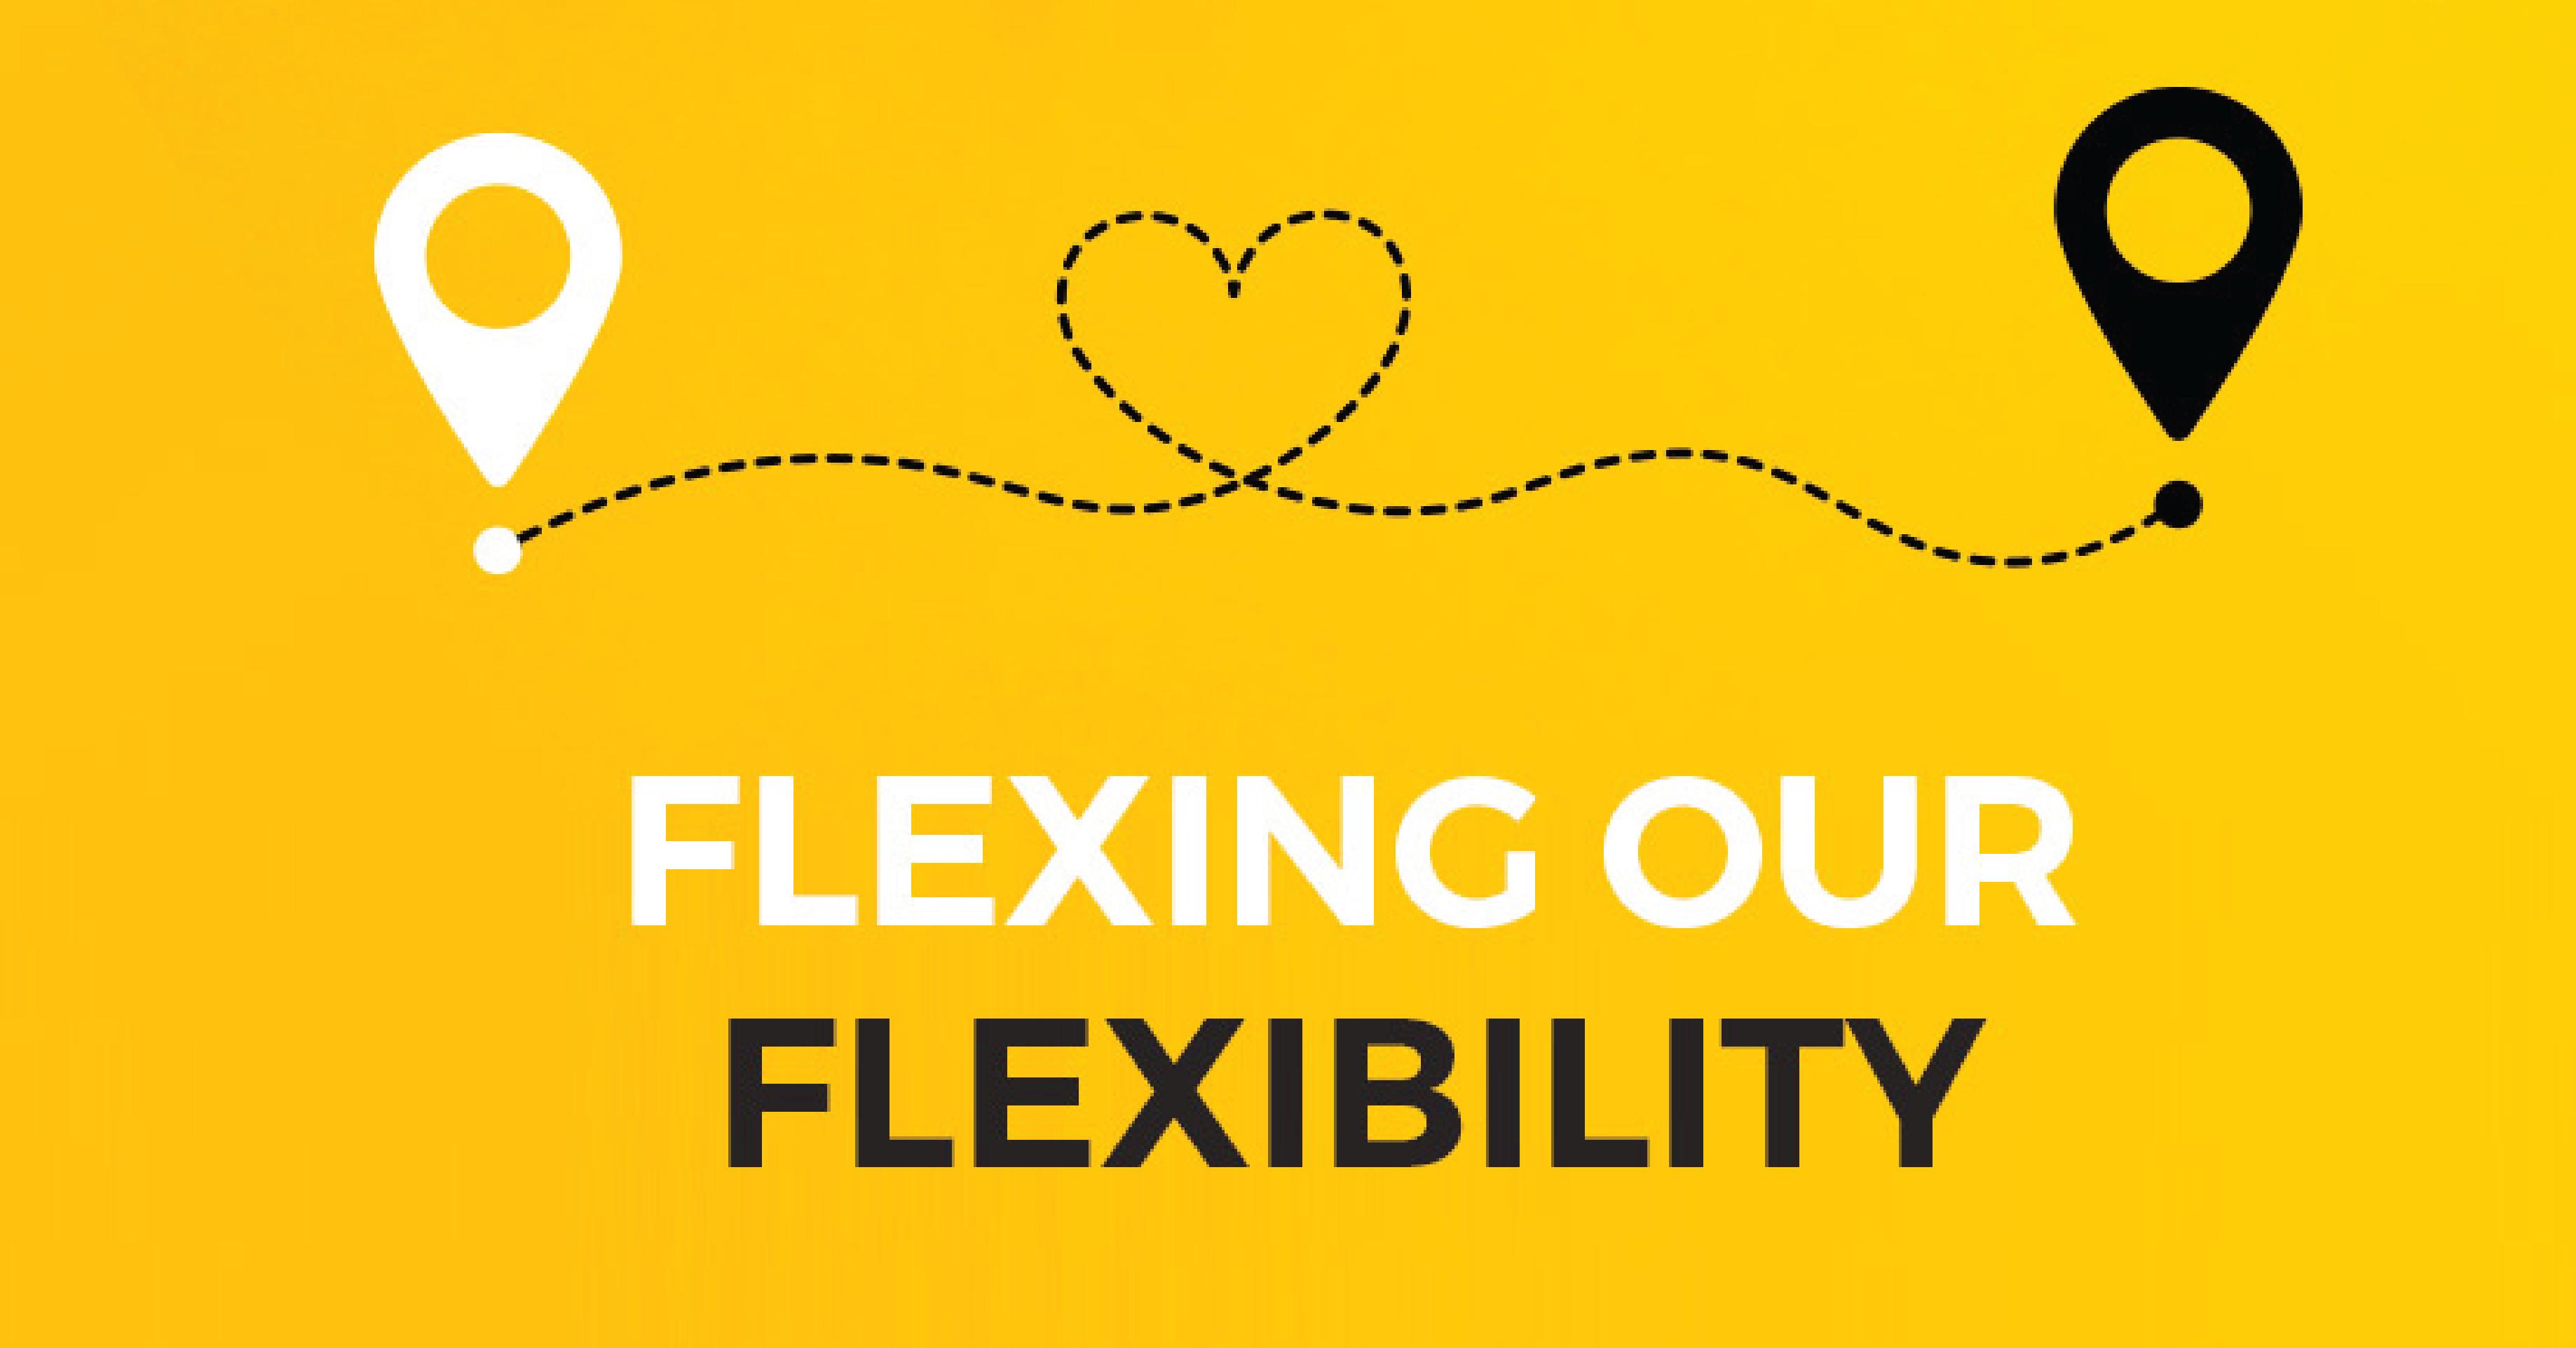 Flexing our flexibility